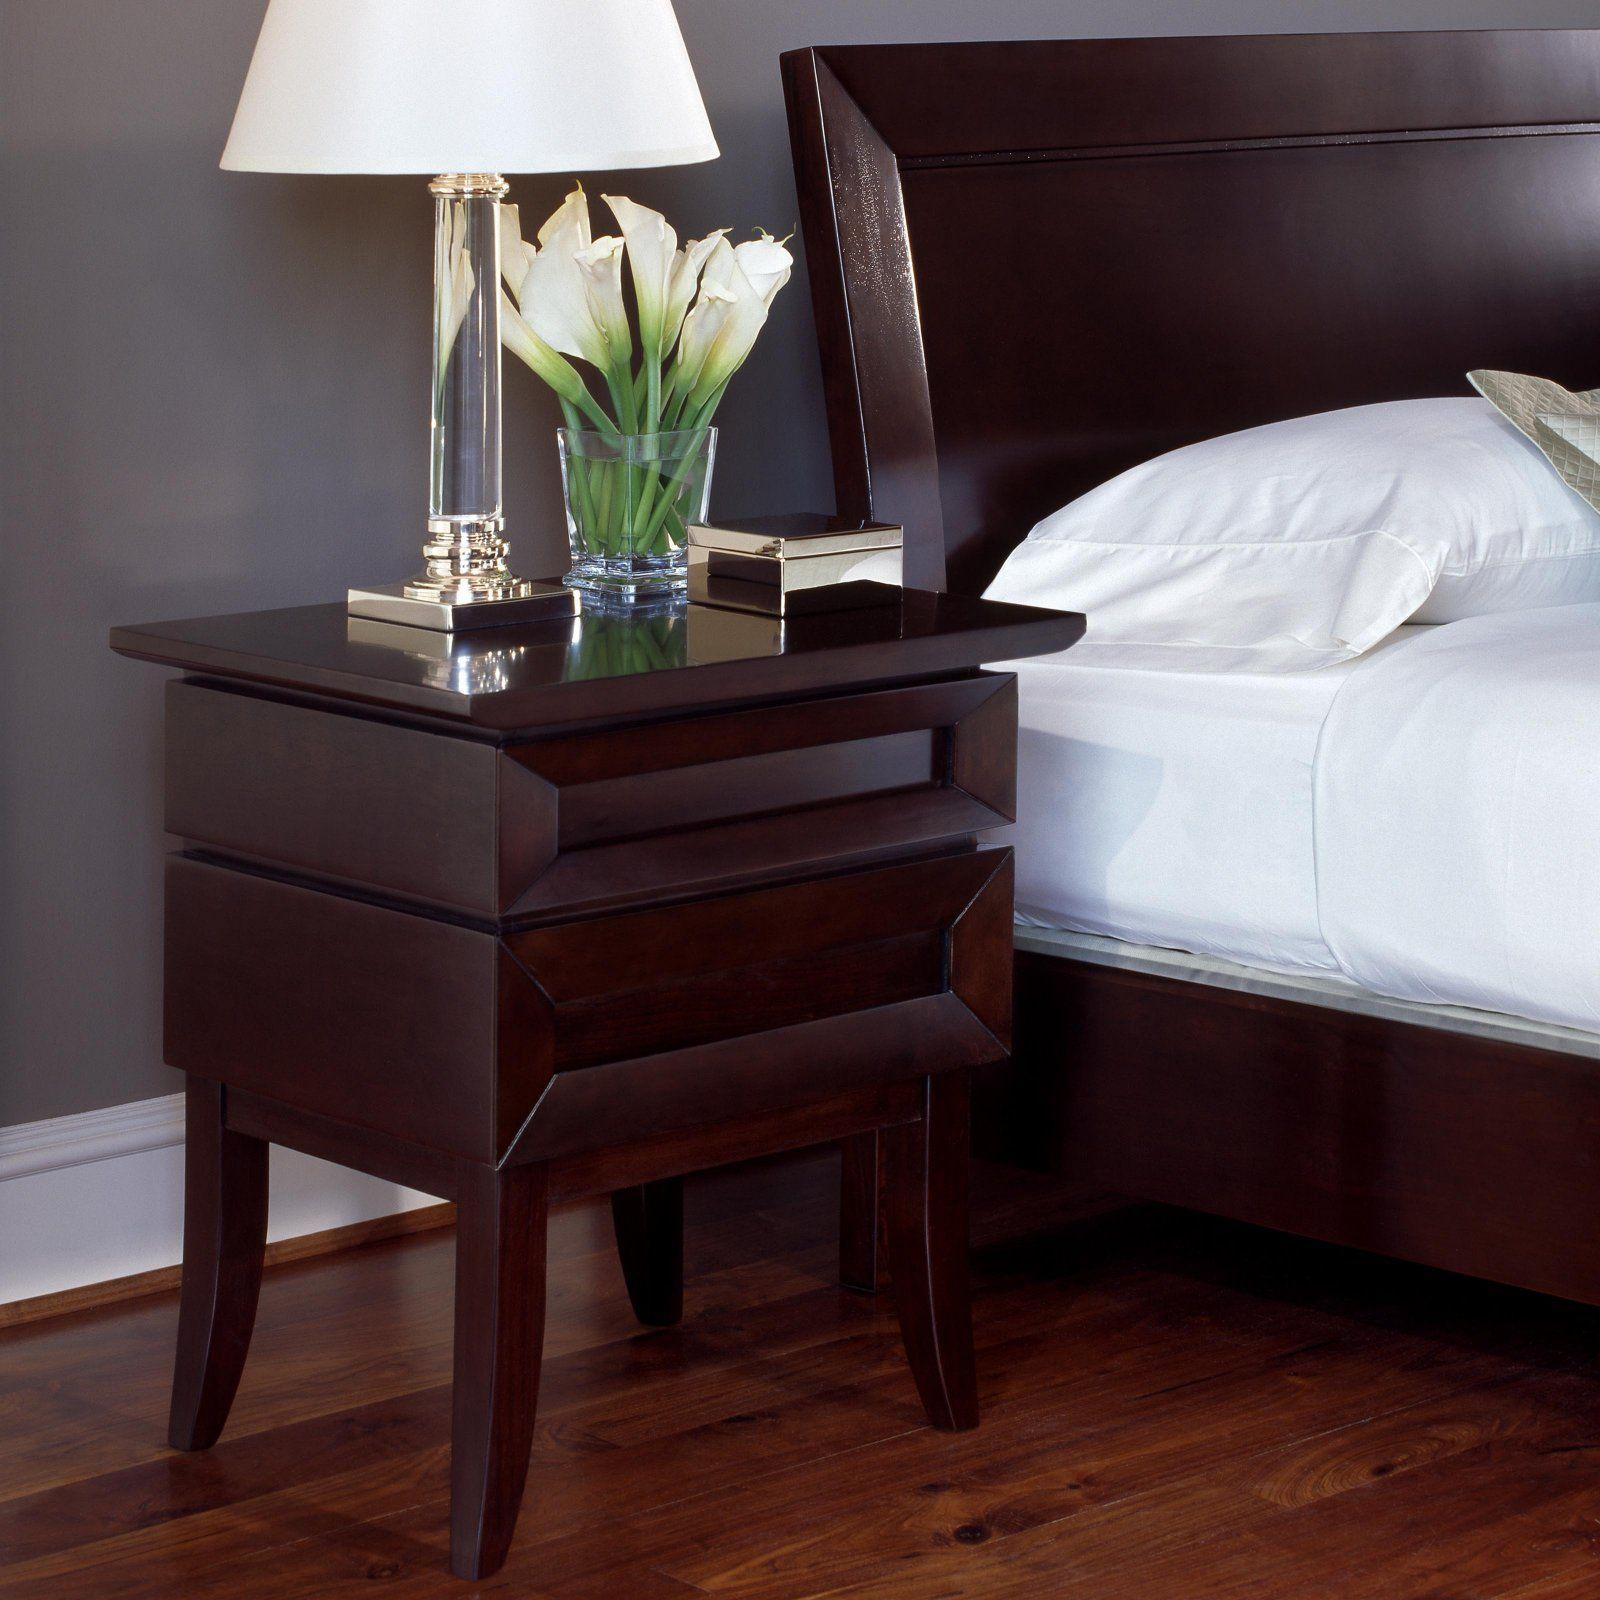 Paint Colors Cherry Wood Furniture Uniqueness Of Black Cane Assist